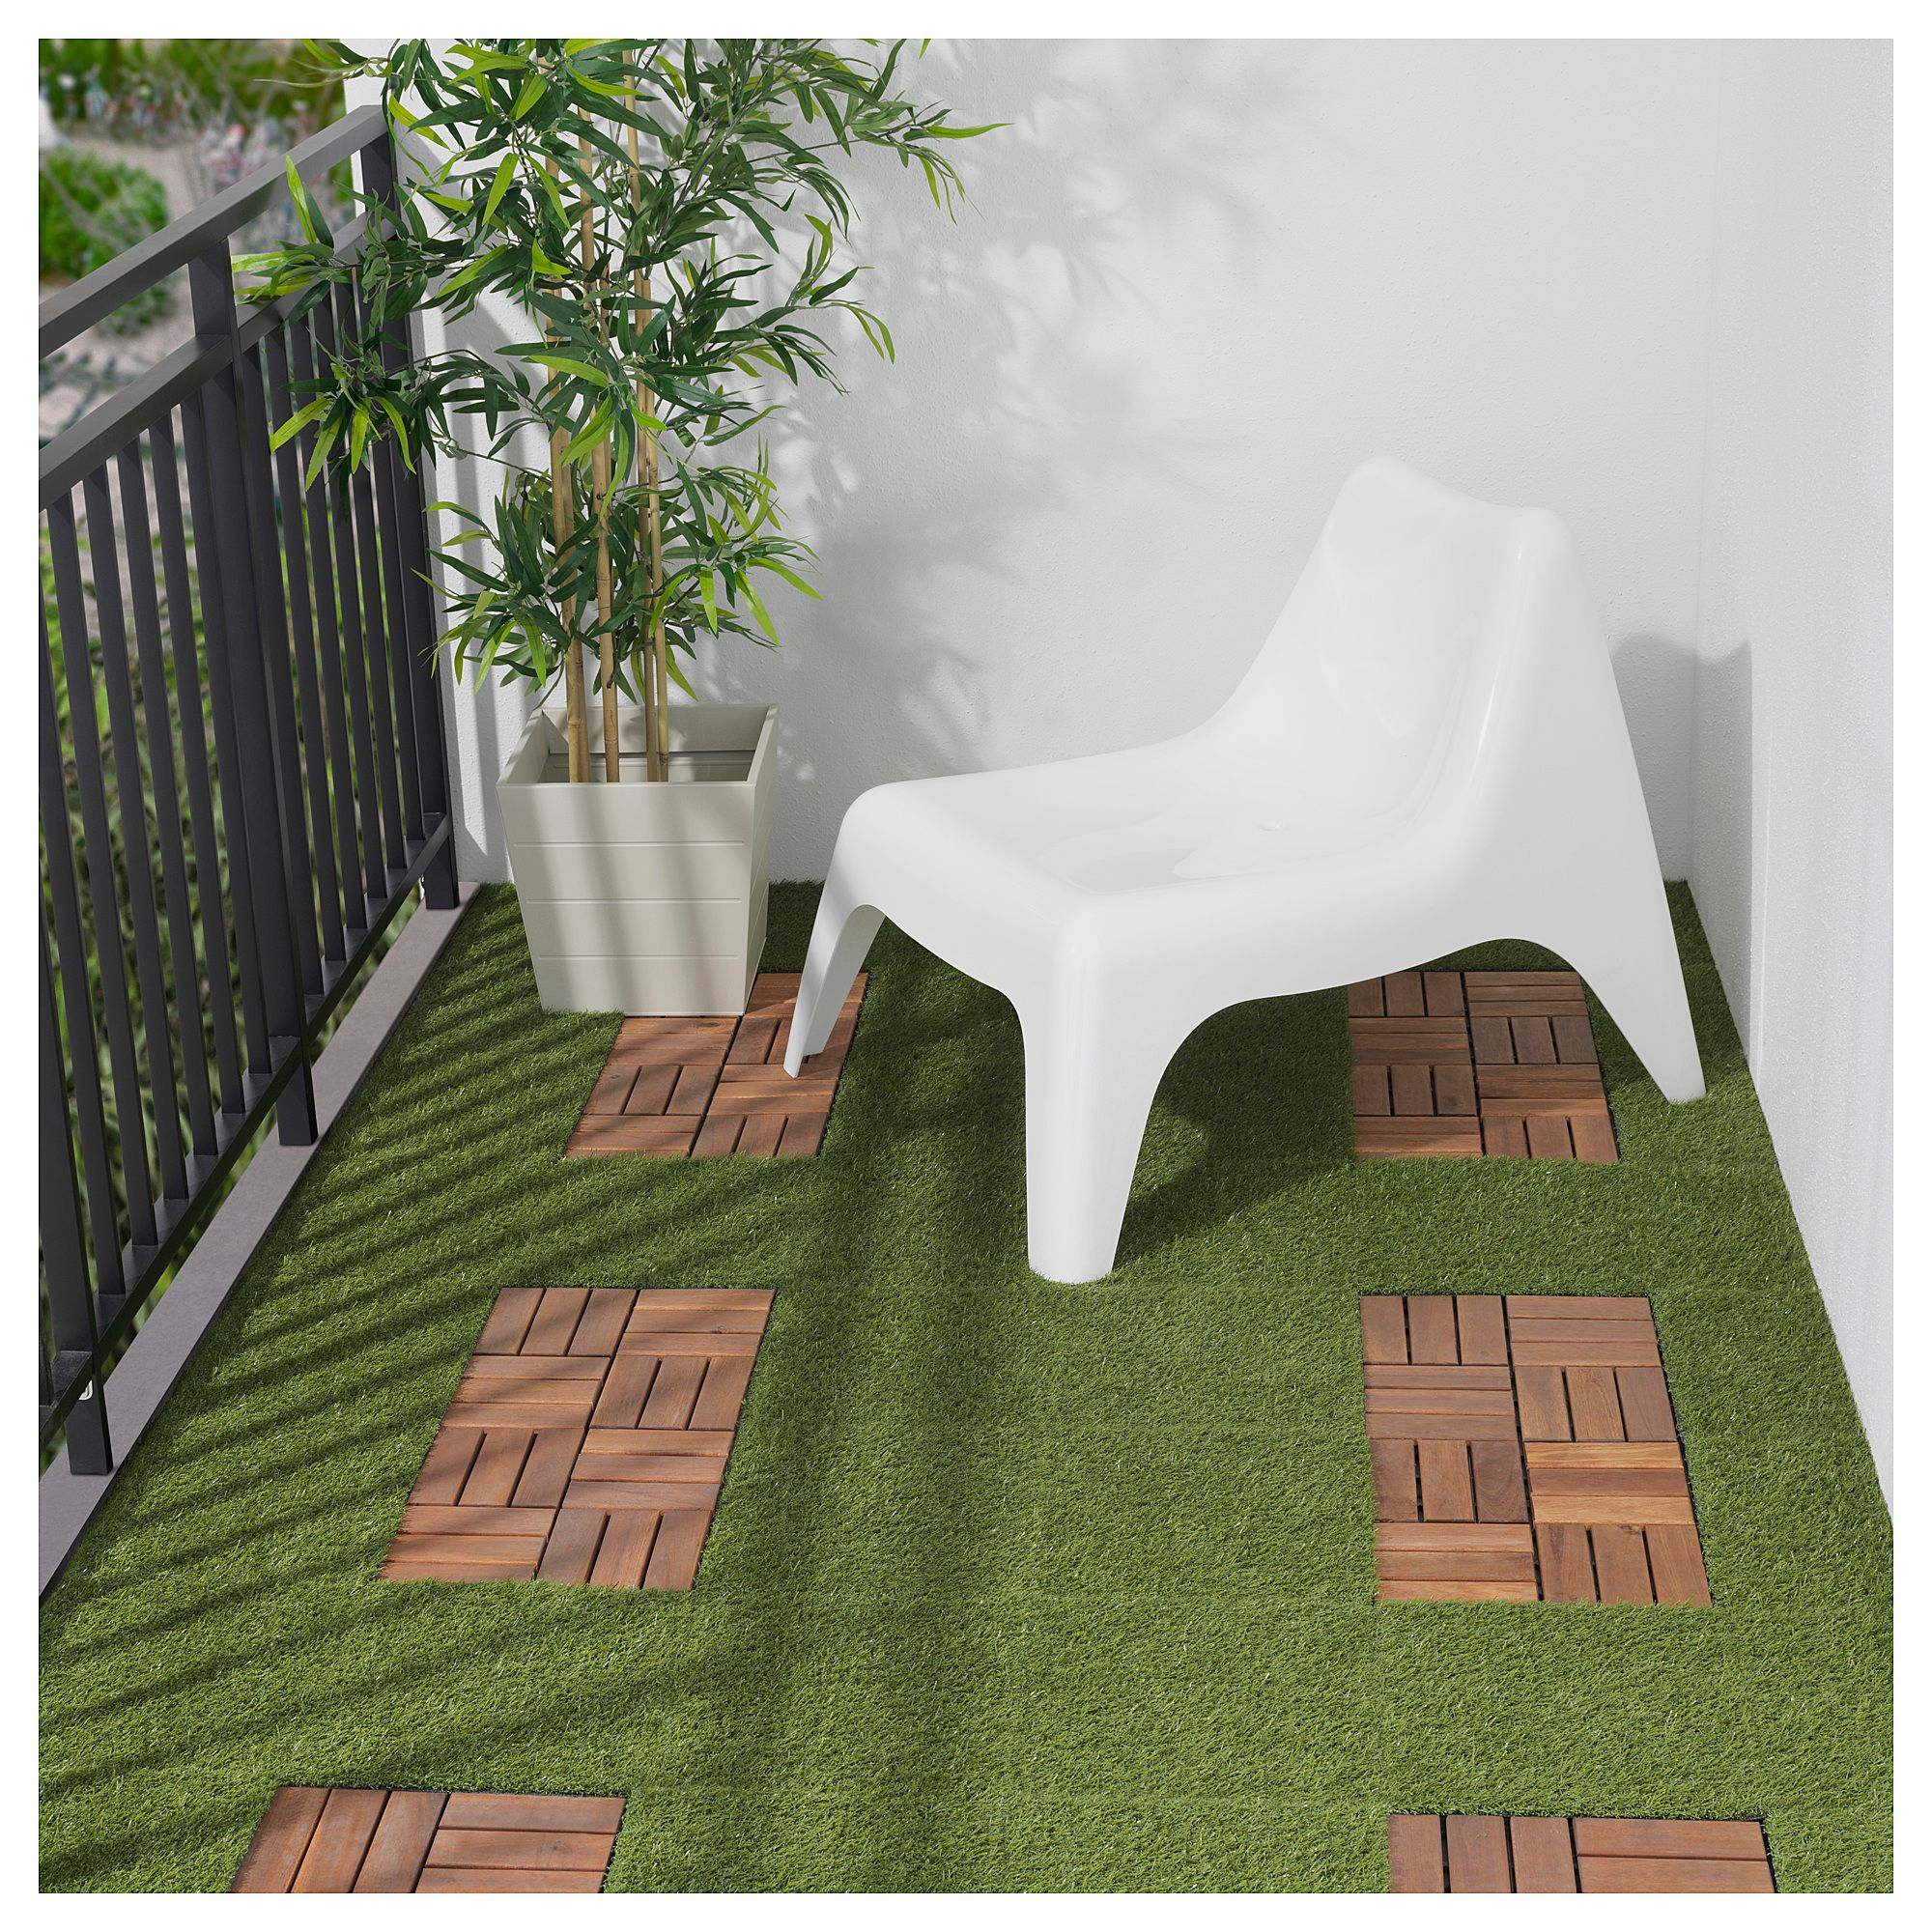 Balcony Artificial Grass Balcony design Pinterest